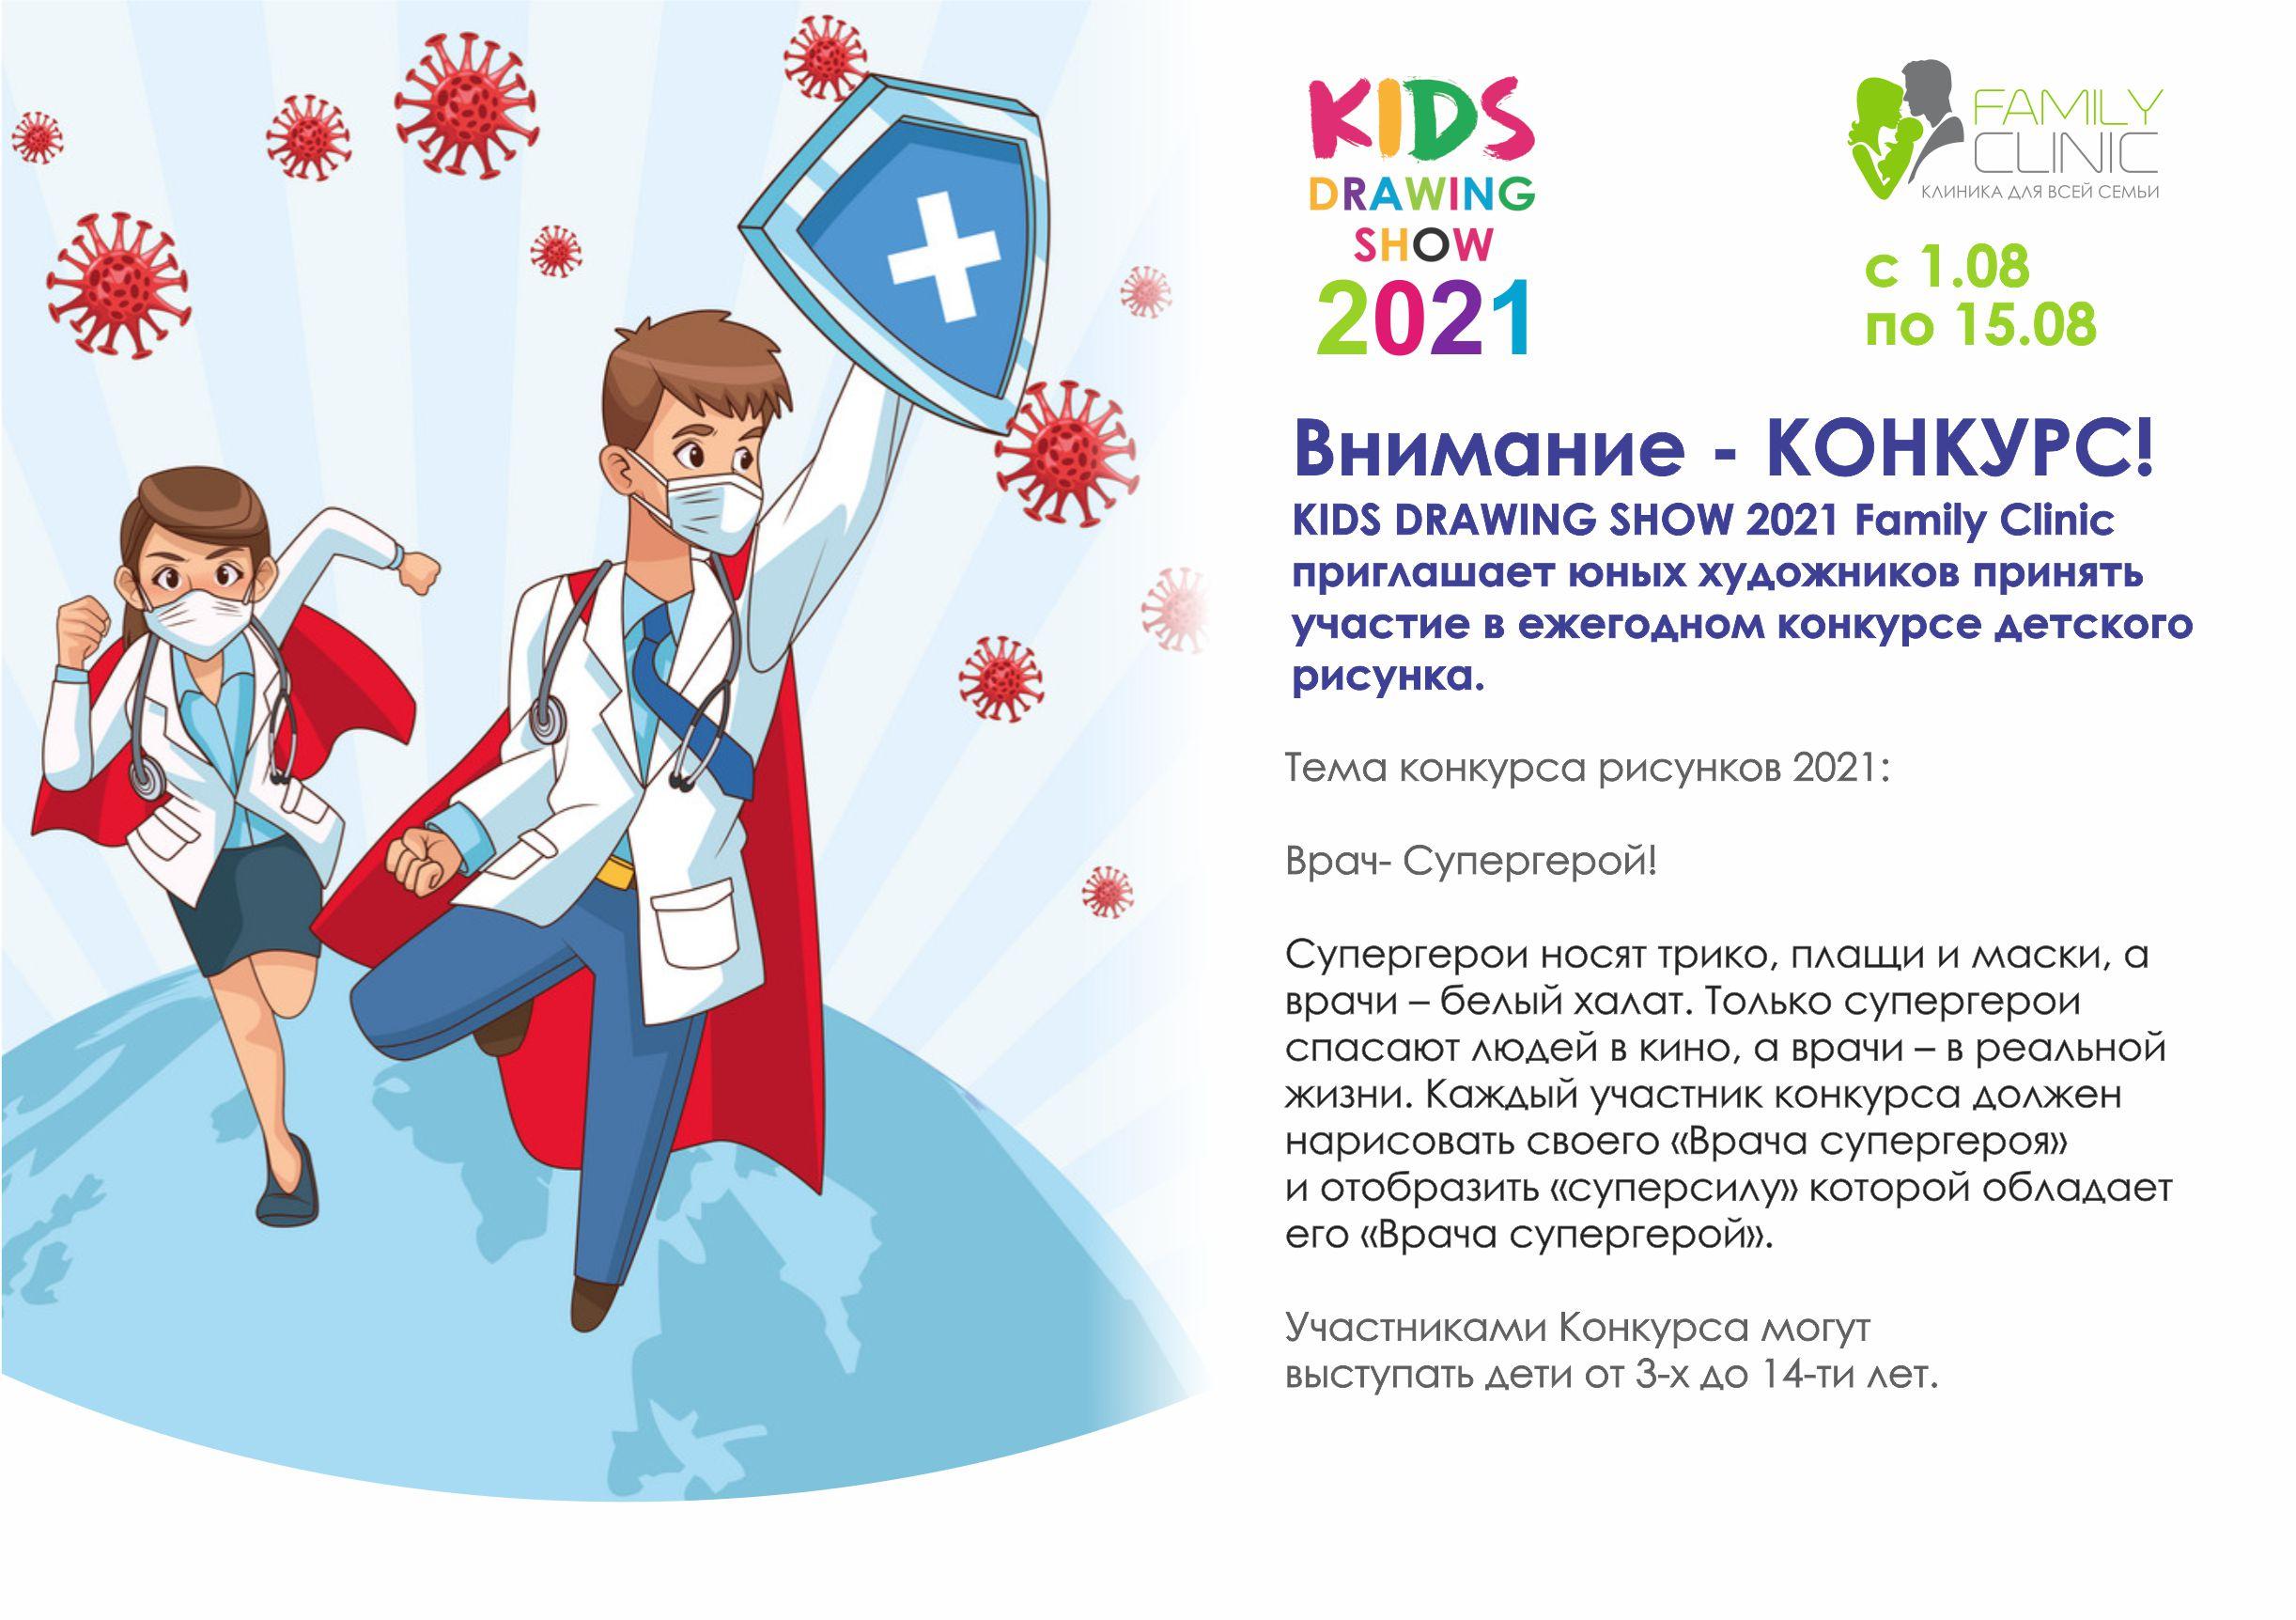 Внимание - КОНКУРС! |KIDS DRAWING SHOW 2021